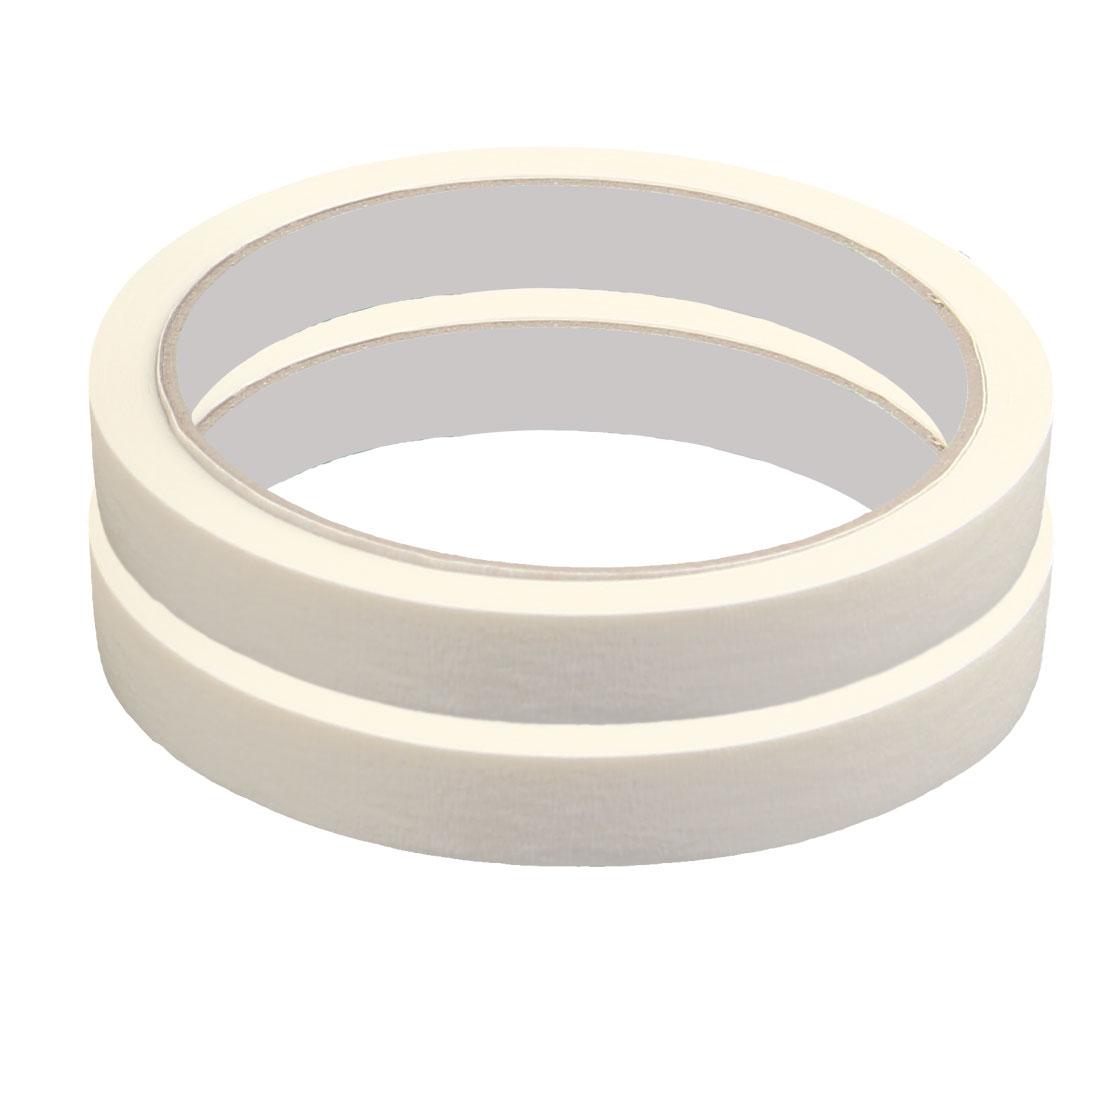 Home Car Paper Writing Masking Adhesive Tape White 1.2cm x 15M 2 Rolls